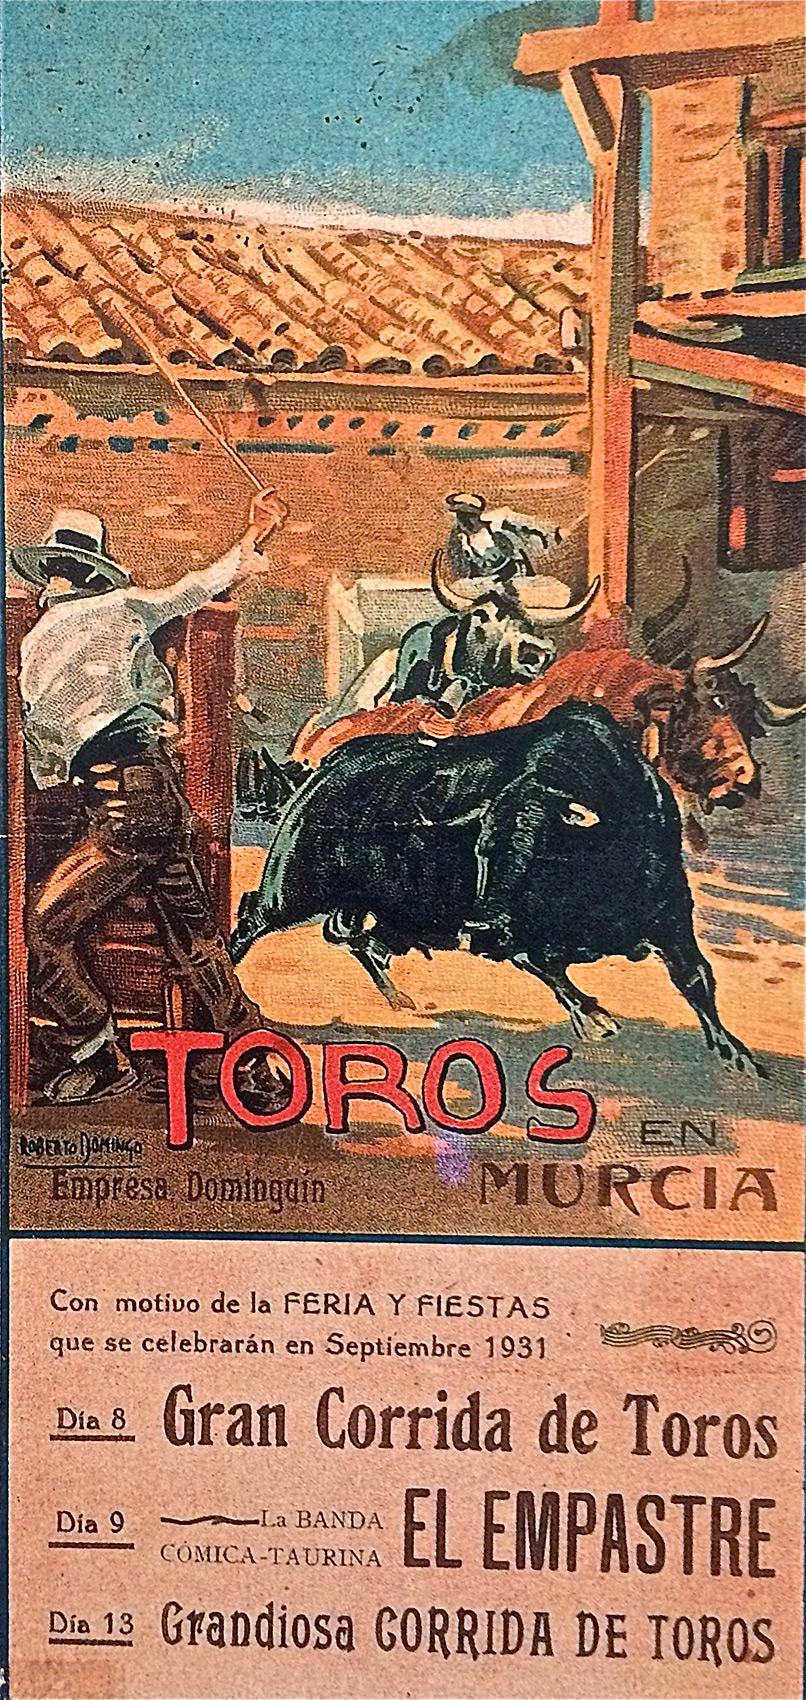 Poster of bulls, Murcia